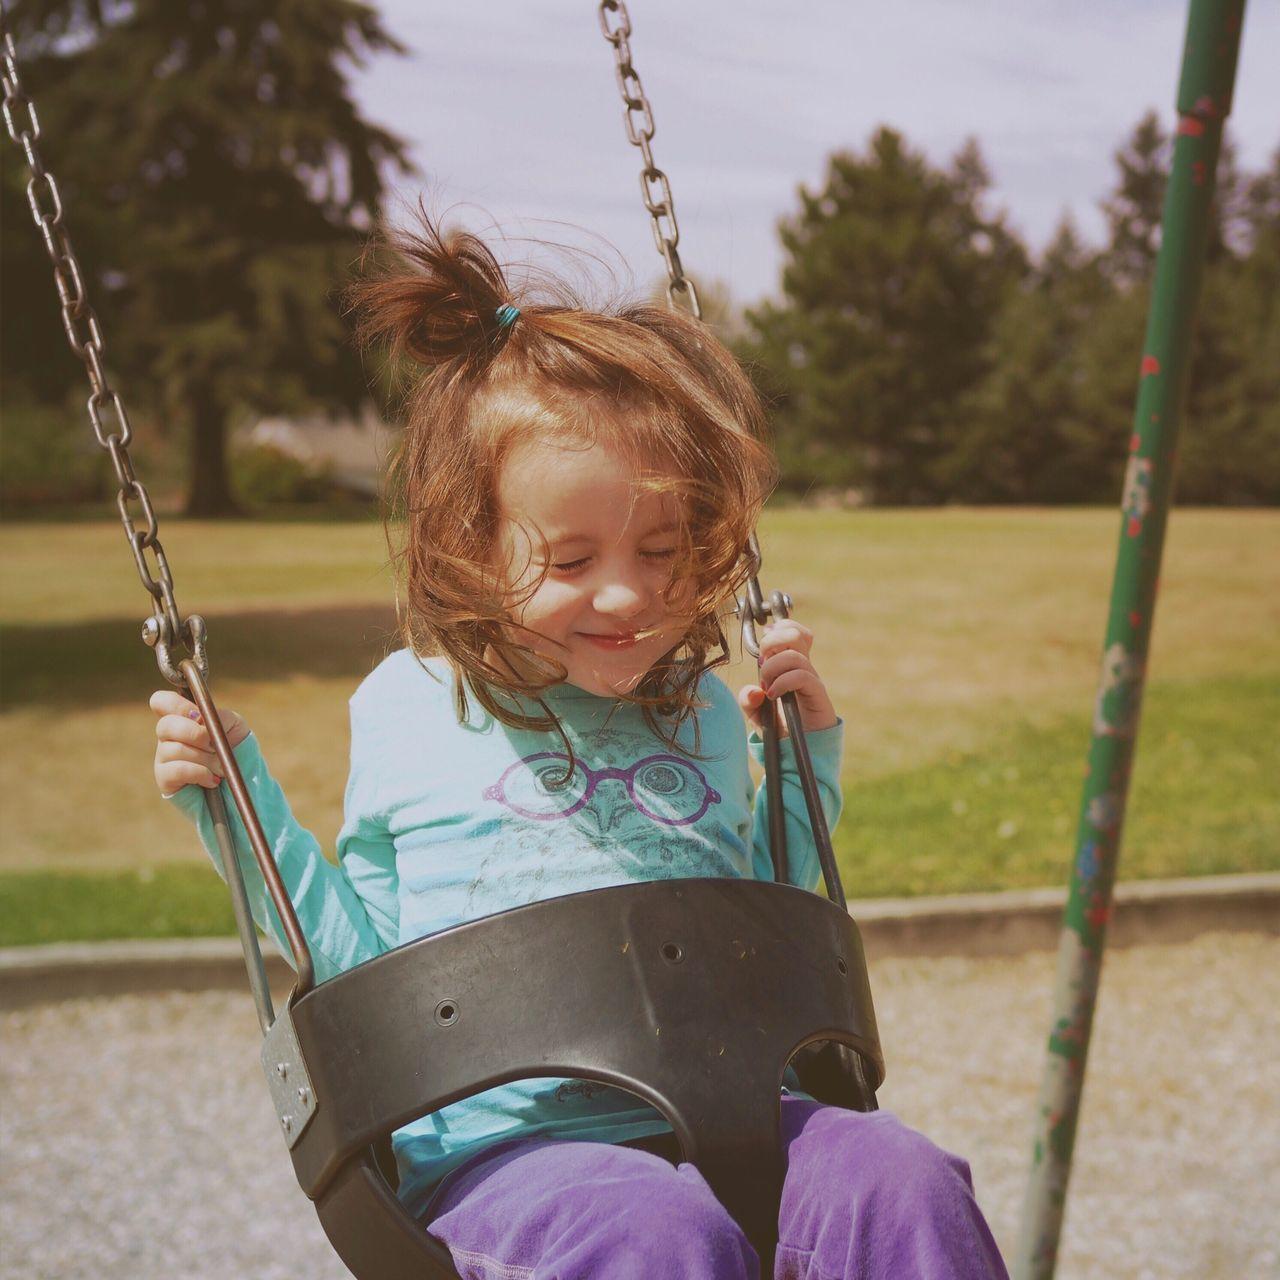 Beautiful stock photos of niedlich, childhood, preschool age, park - man made space, playground